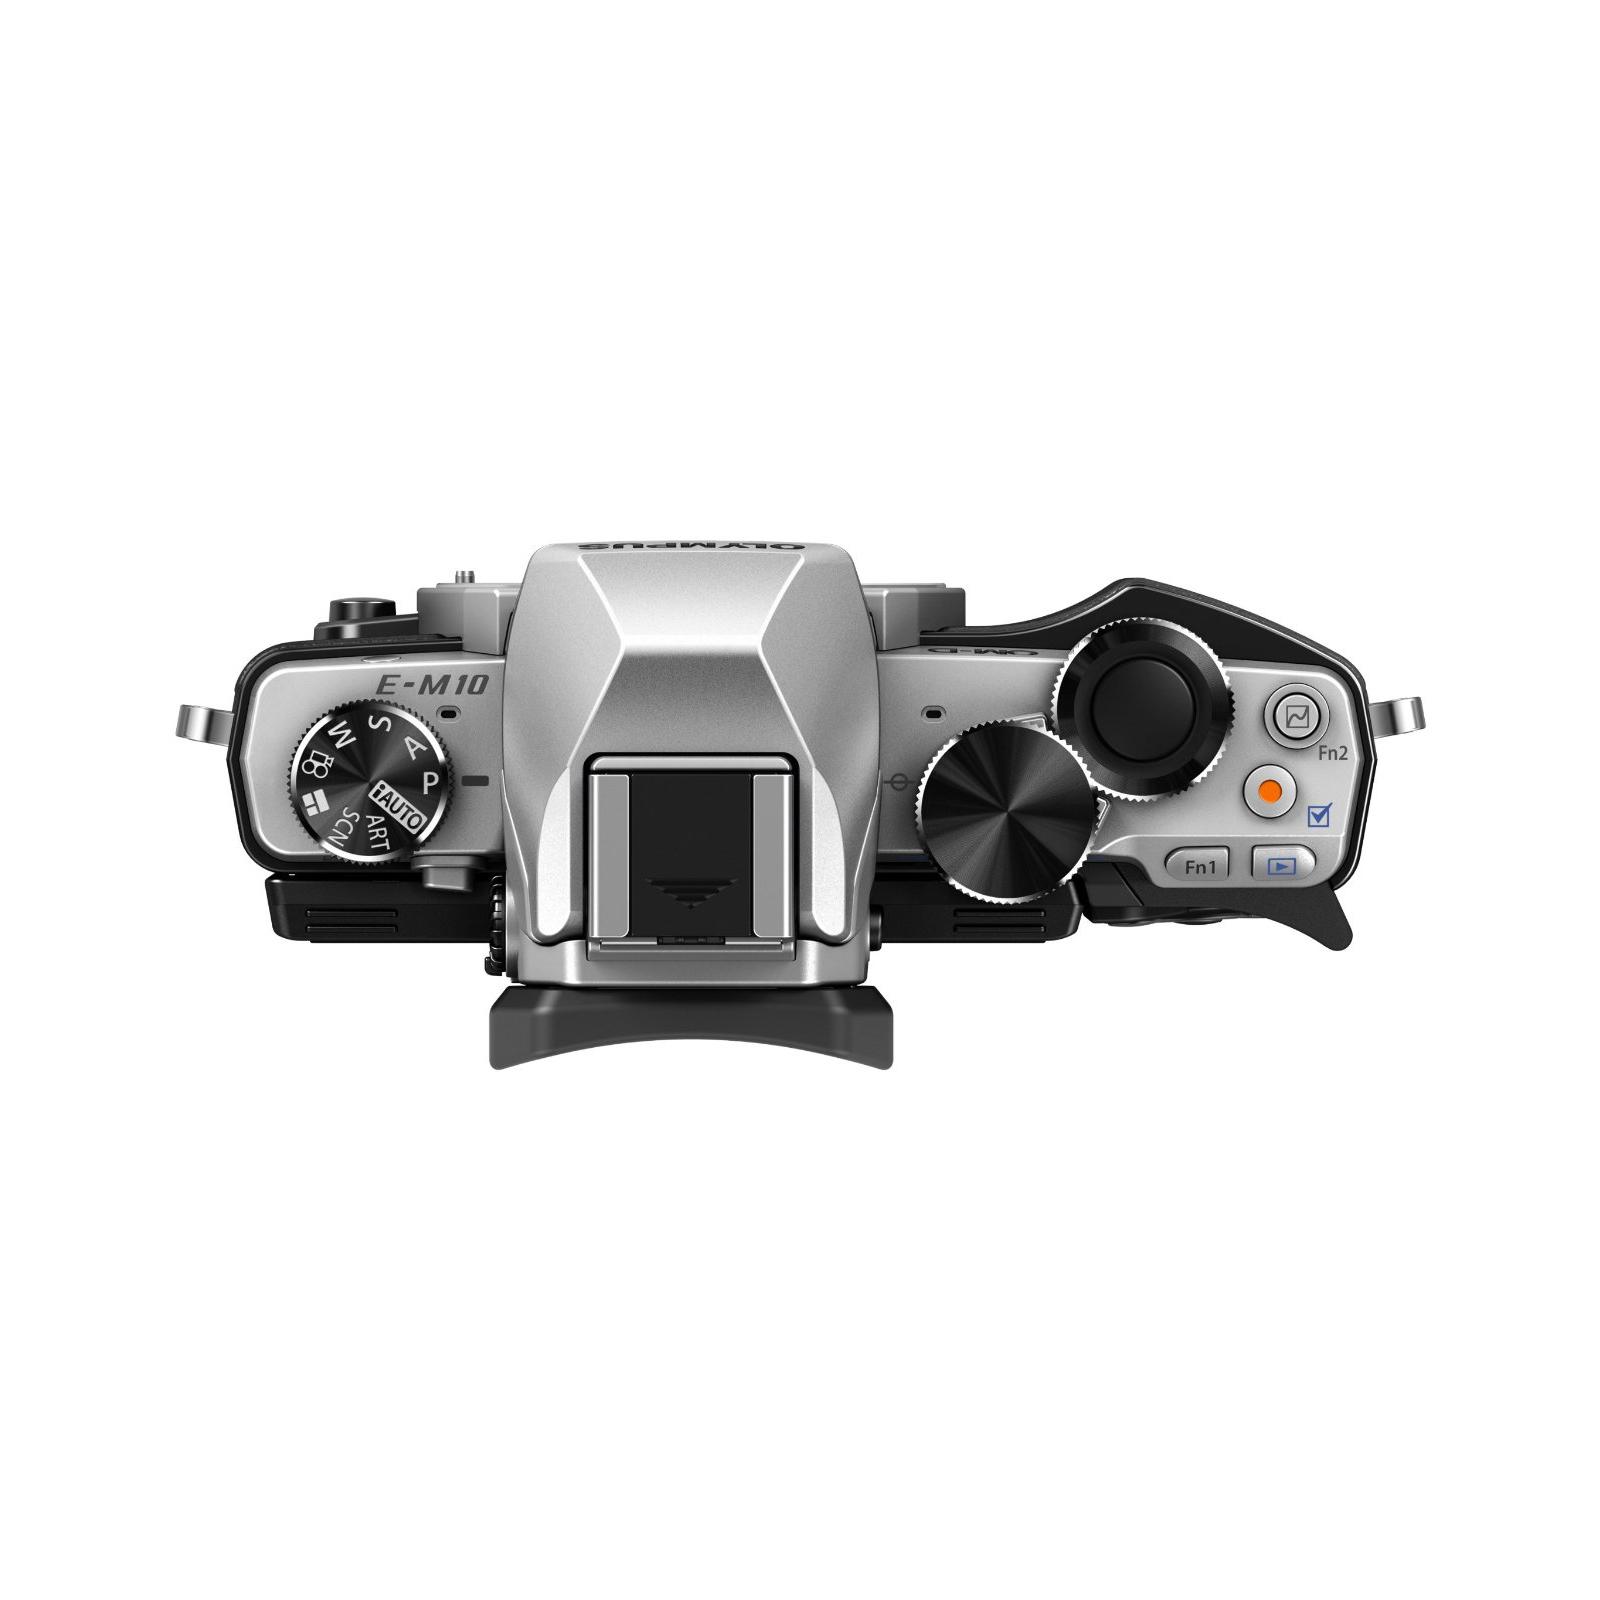 Цифровой фотоаппарат OLYMPUS E-M10 14-42 Kit silver/black (V207021SE000) изображение 4